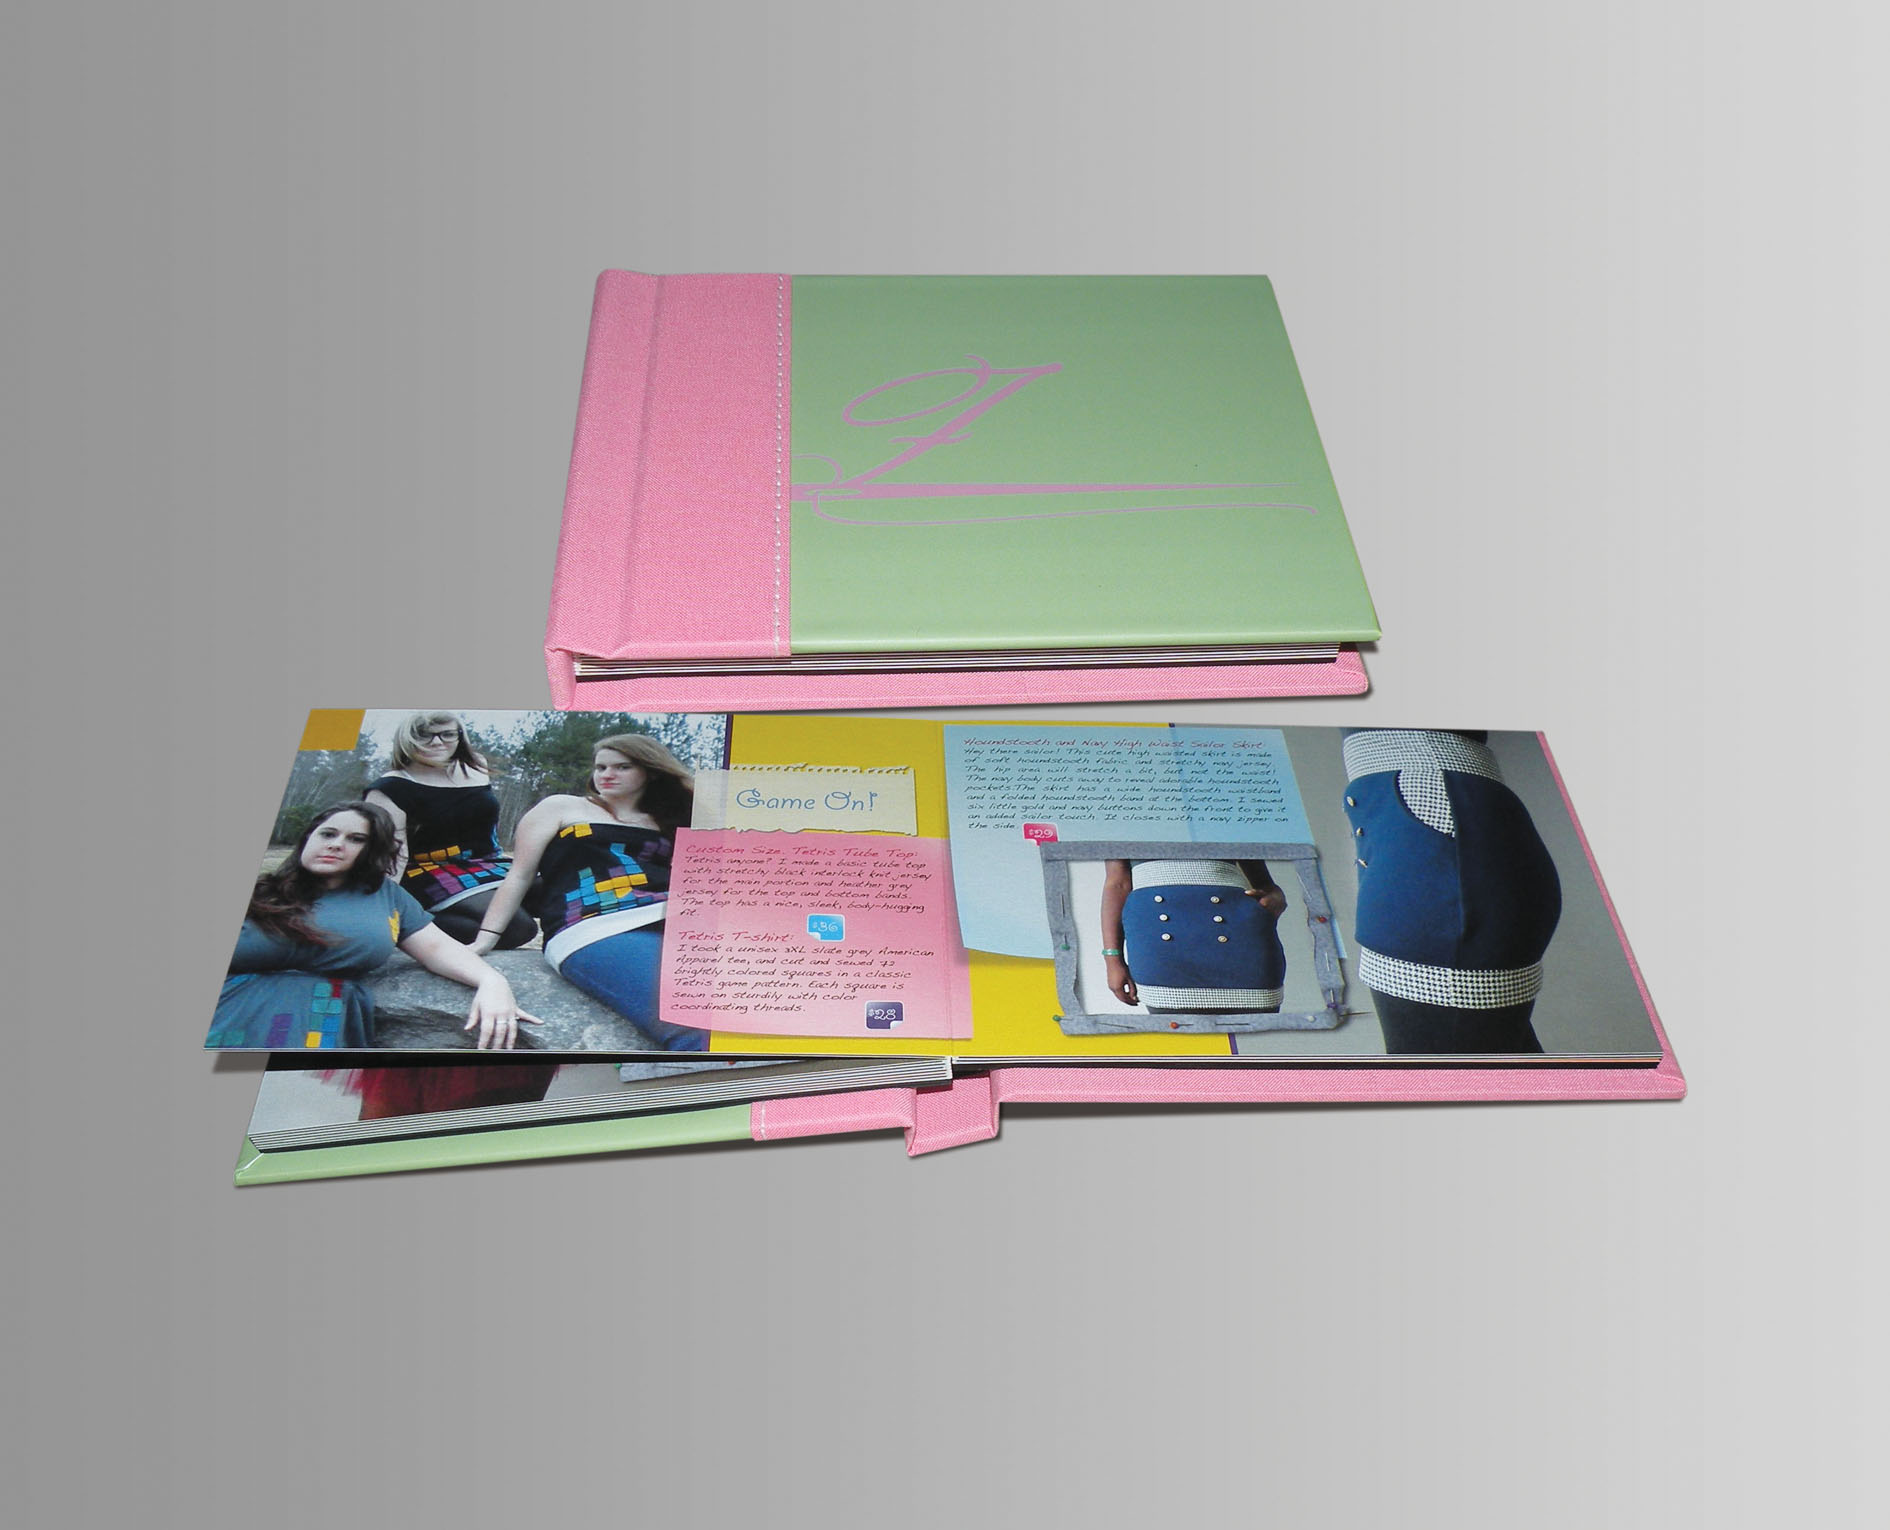 Zidisha Catalog